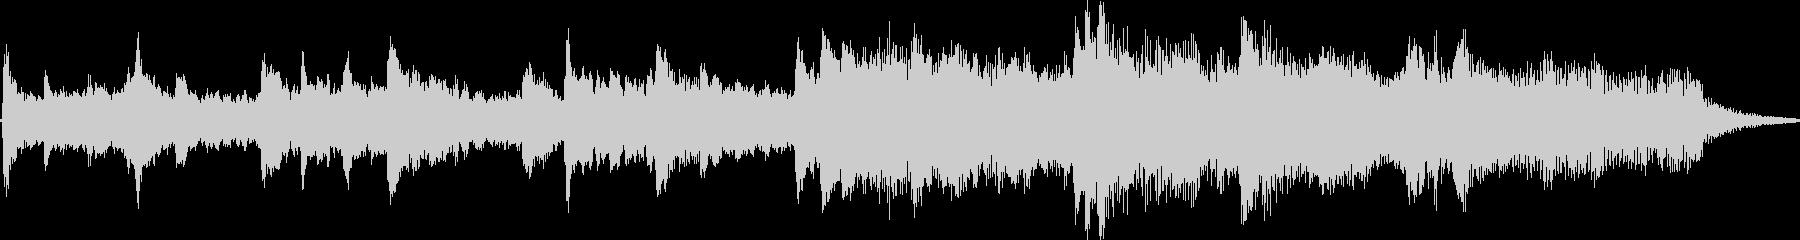 BGM whose transparent piano tone is impressive's unreproduced waveform